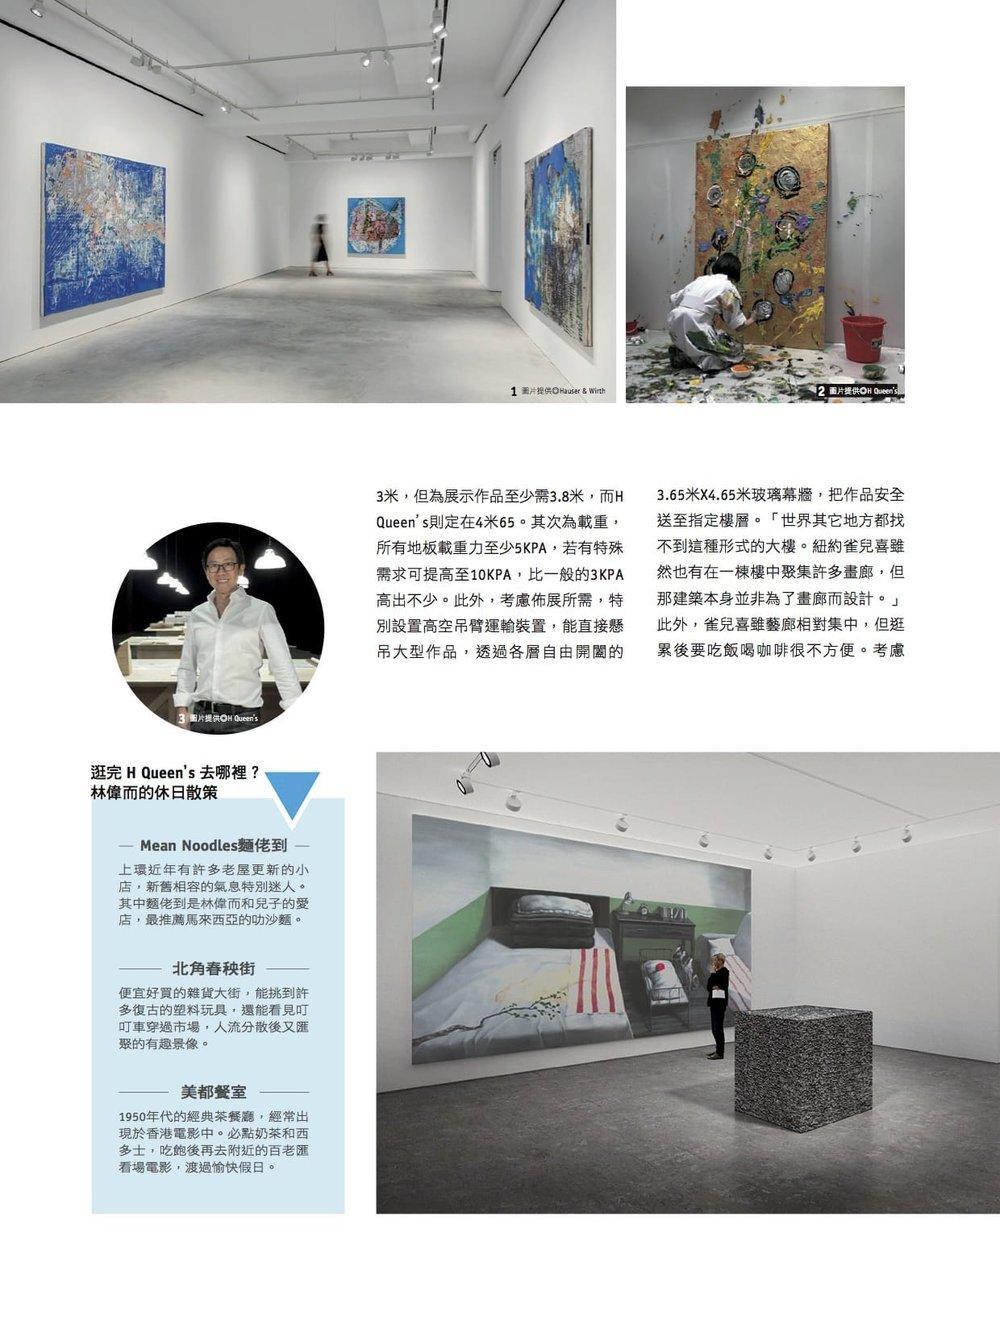 Lavie_170_034-037_CREATIVE CITY_一棟高樓的藝術野心 全球首創垂直畫廊聚落3.jpg